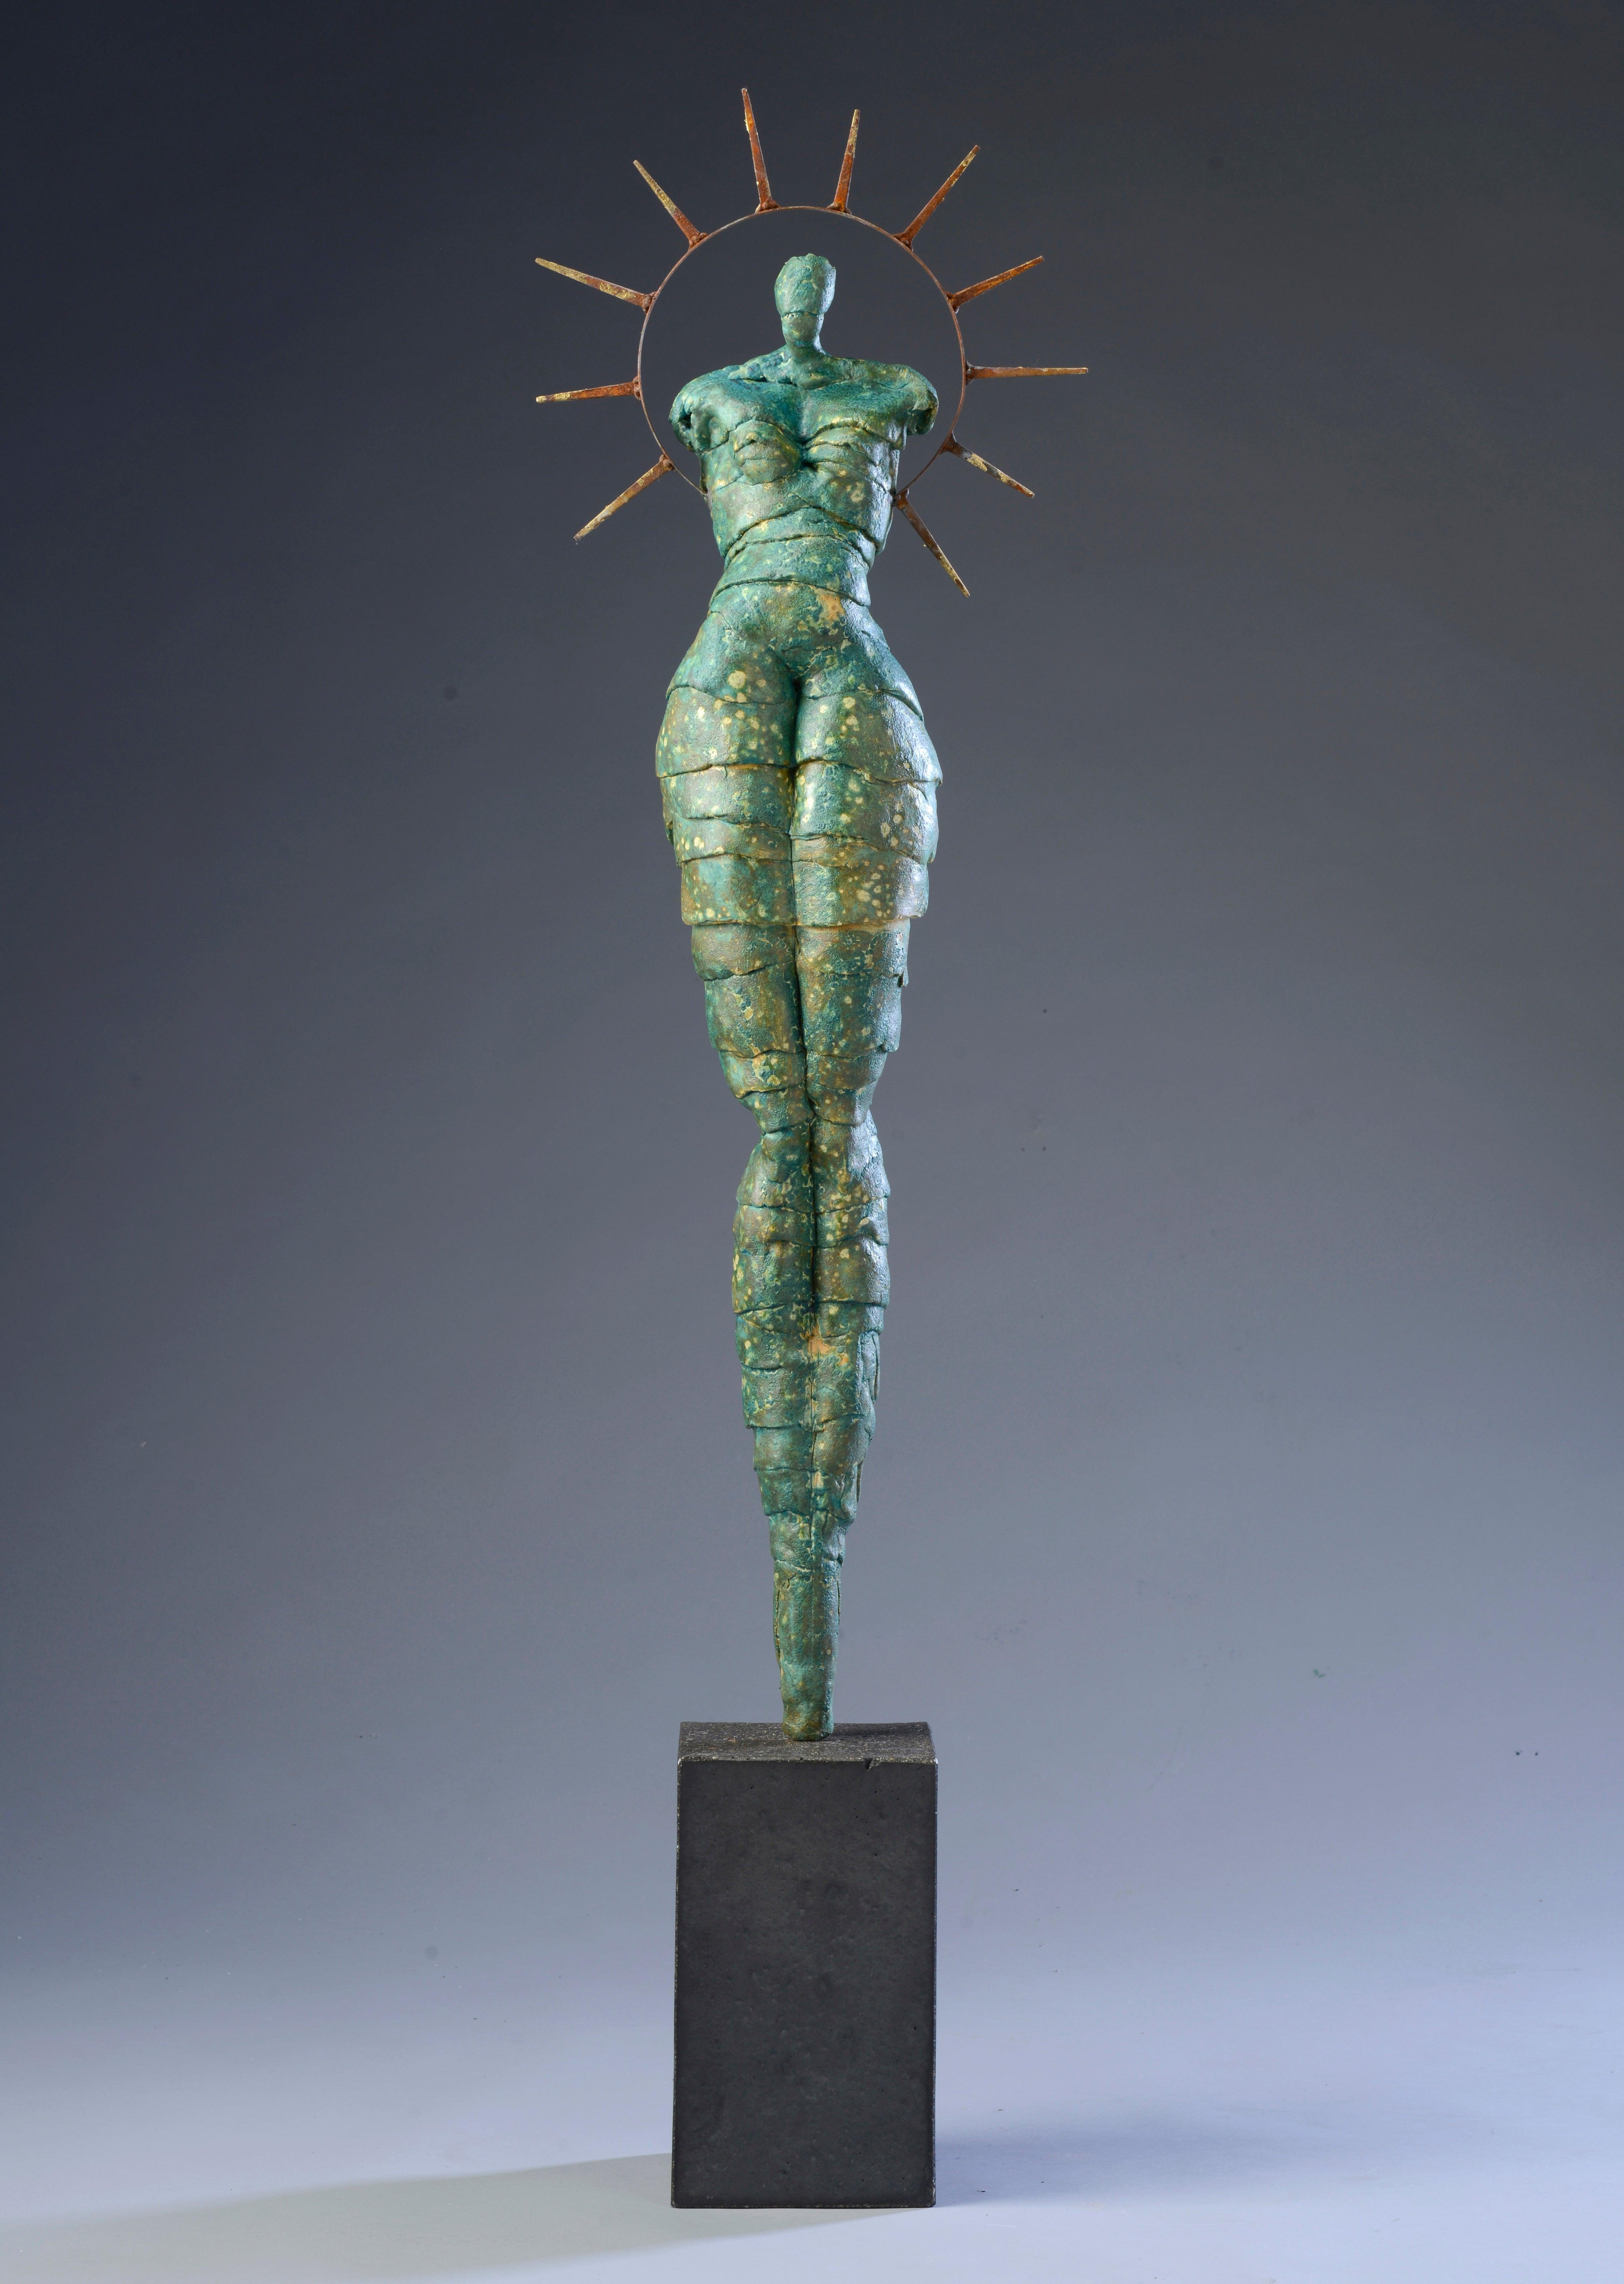 "Contemporary Figurative Sculpture Ceramic Green Gold Patina Woman Body 52"" Tall"